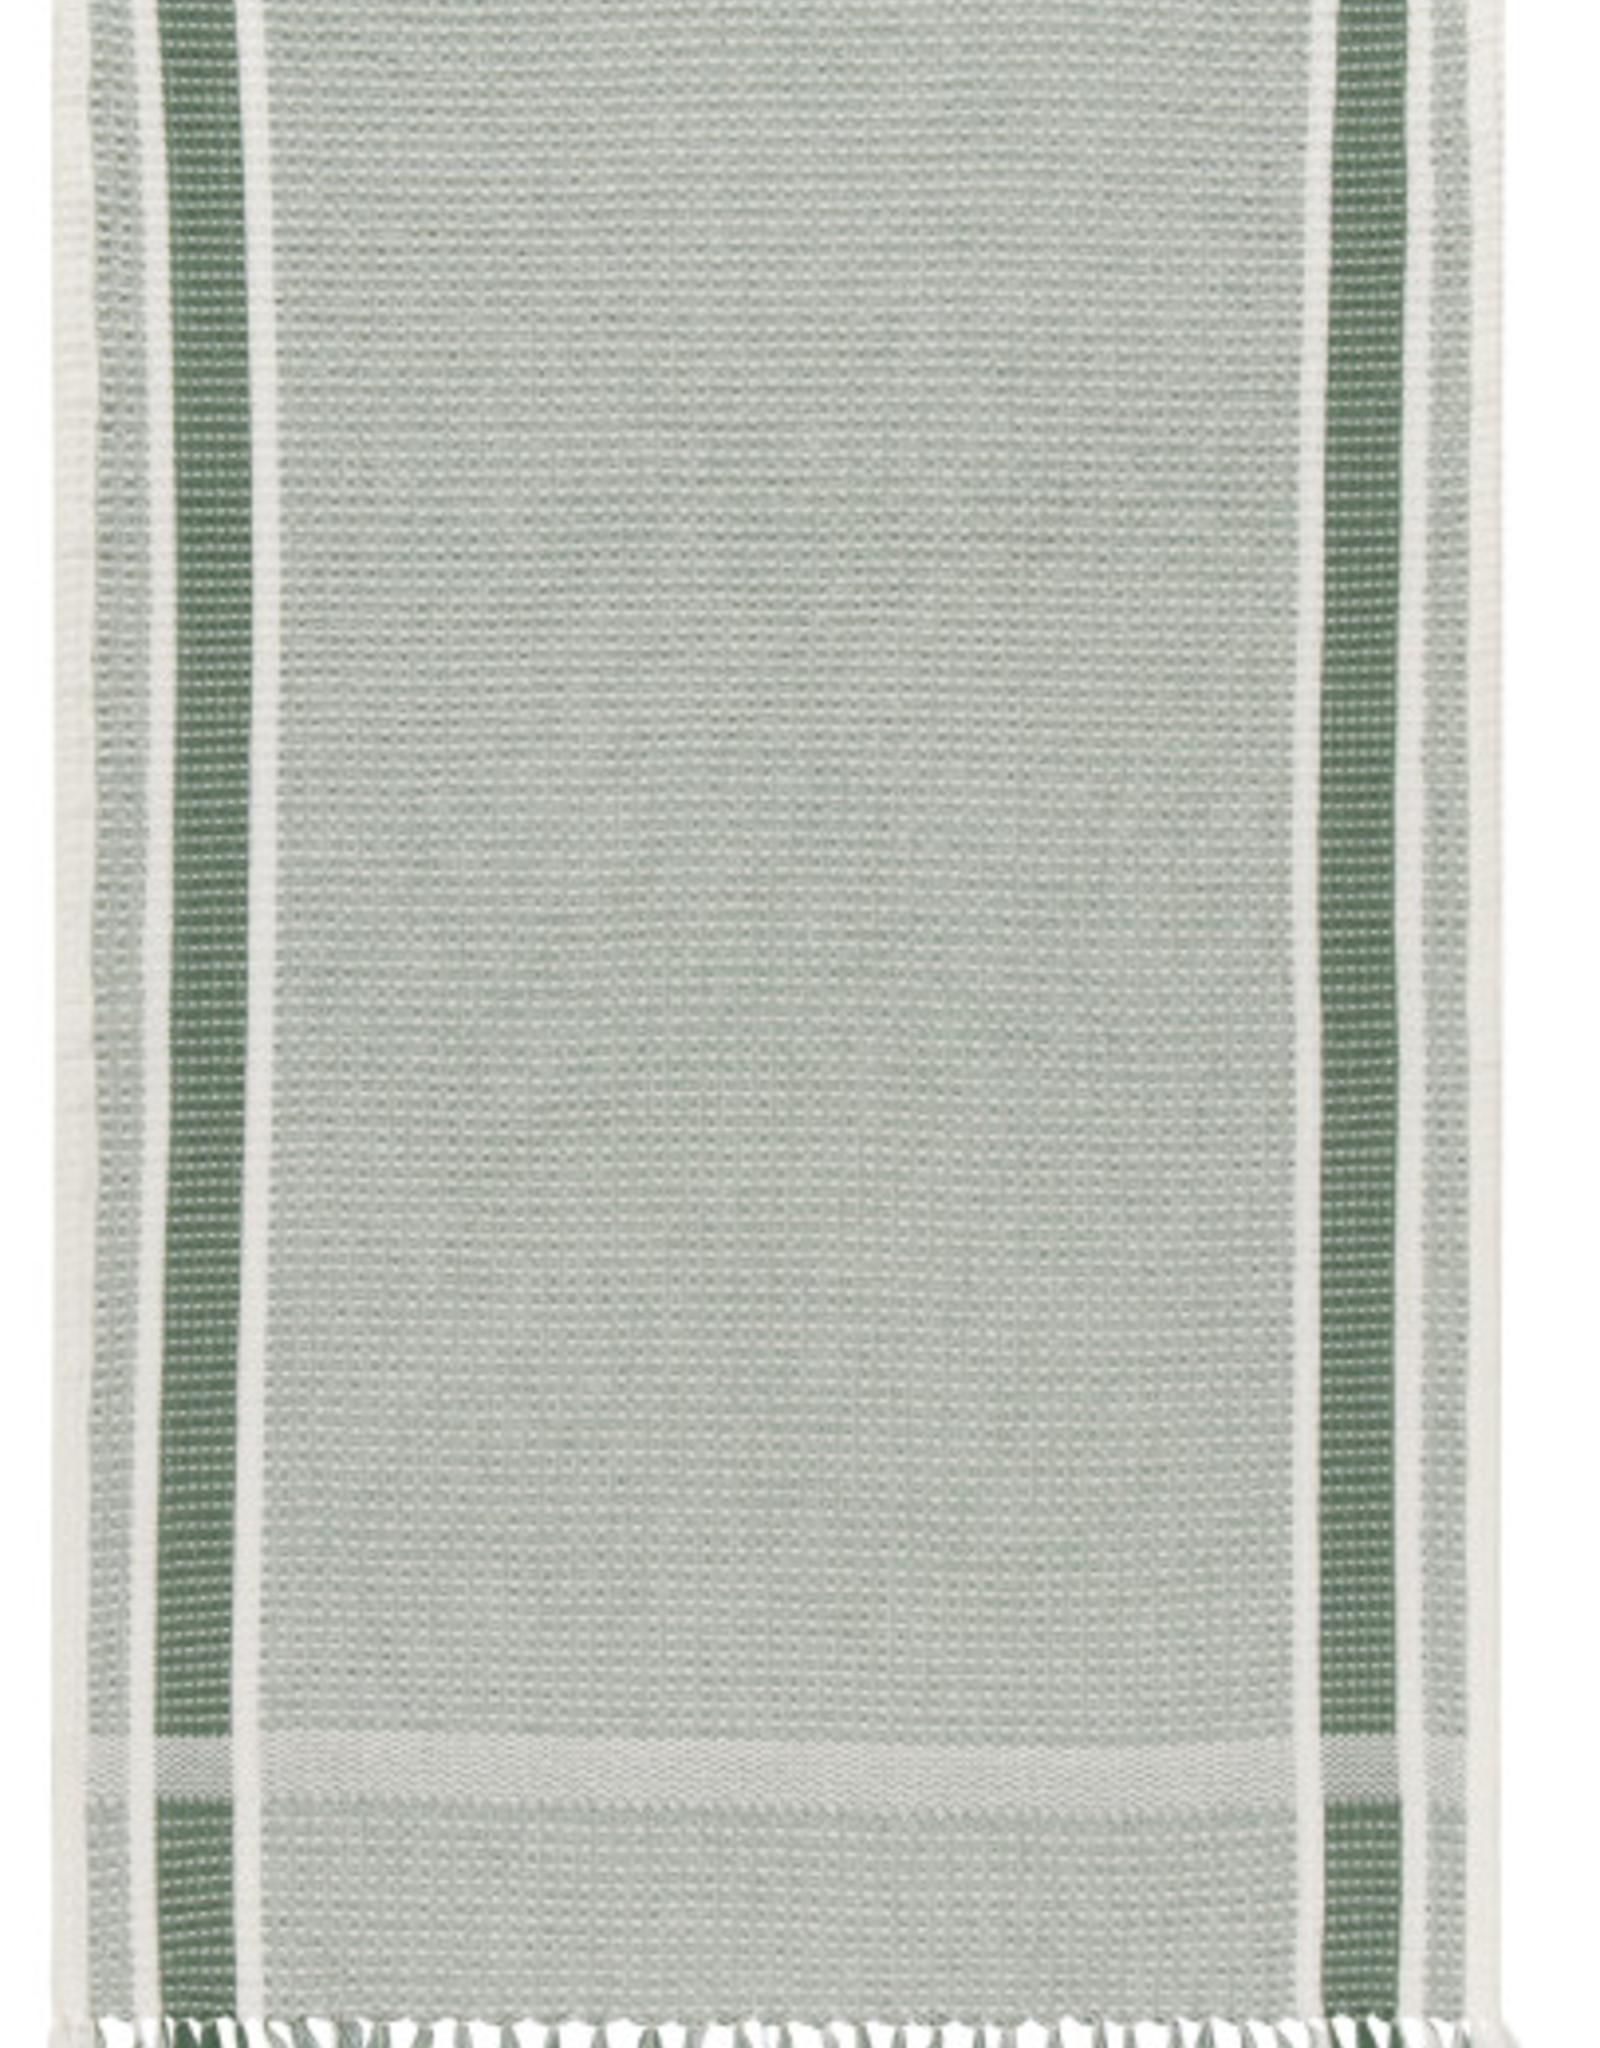 Danica Danica Waffle Tea Towel-Jade